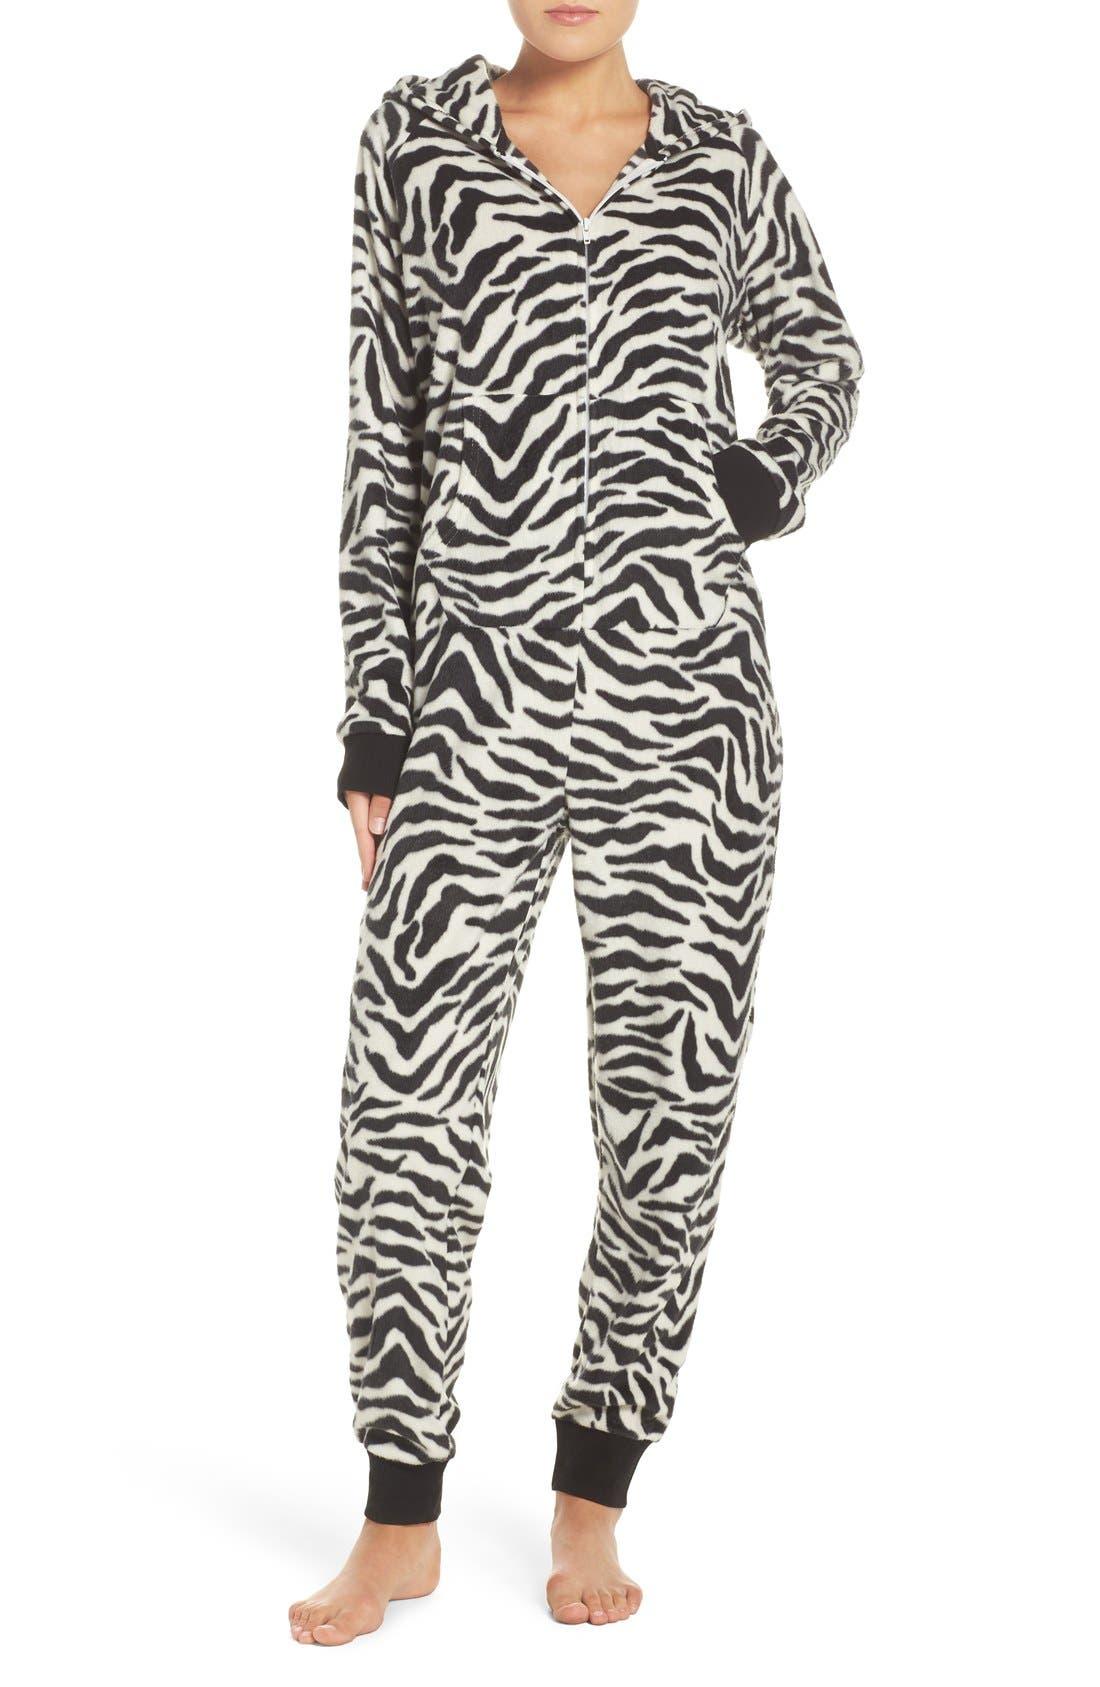 Main Image - COZY ZOE 'Critter' Zebra One-Piece Pajamas